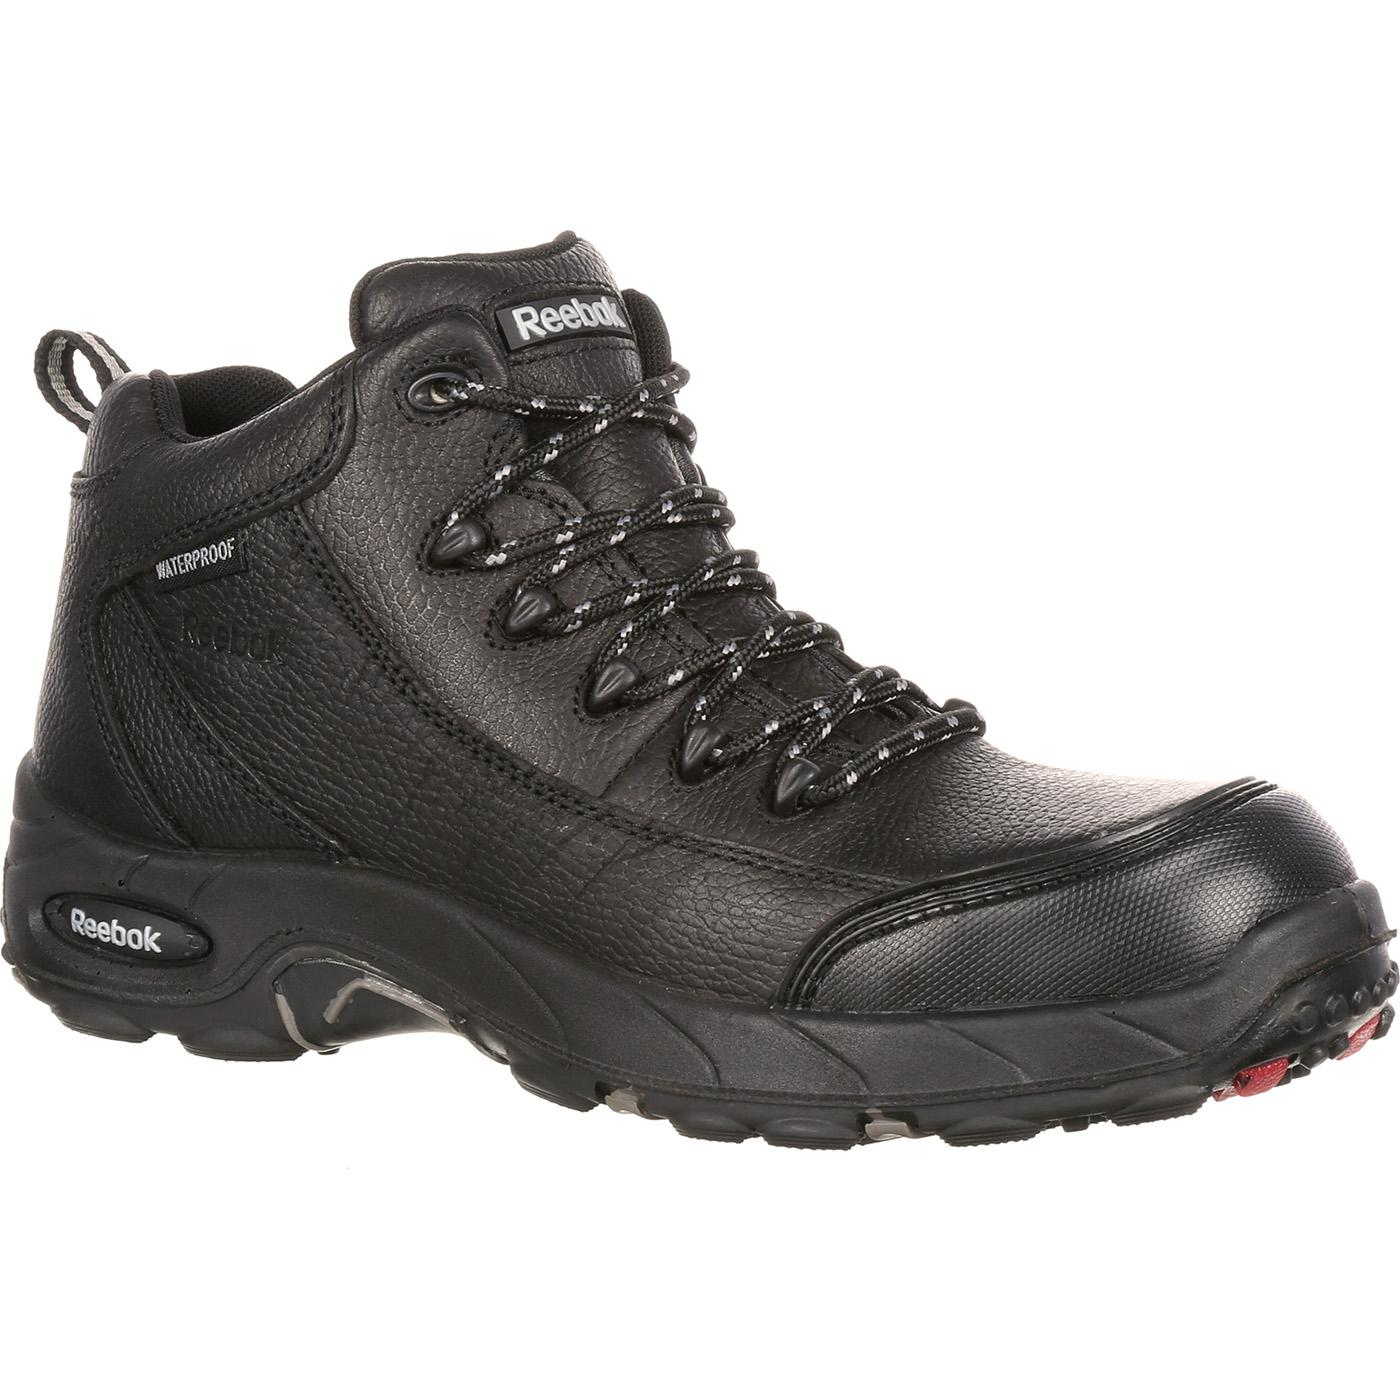 775a51513d9 Reebok Tiahawk Composite Toe Waterproof Hiker Work BootReebok Tiahawk Composite  Toe Waterproof Hiker Work Boot